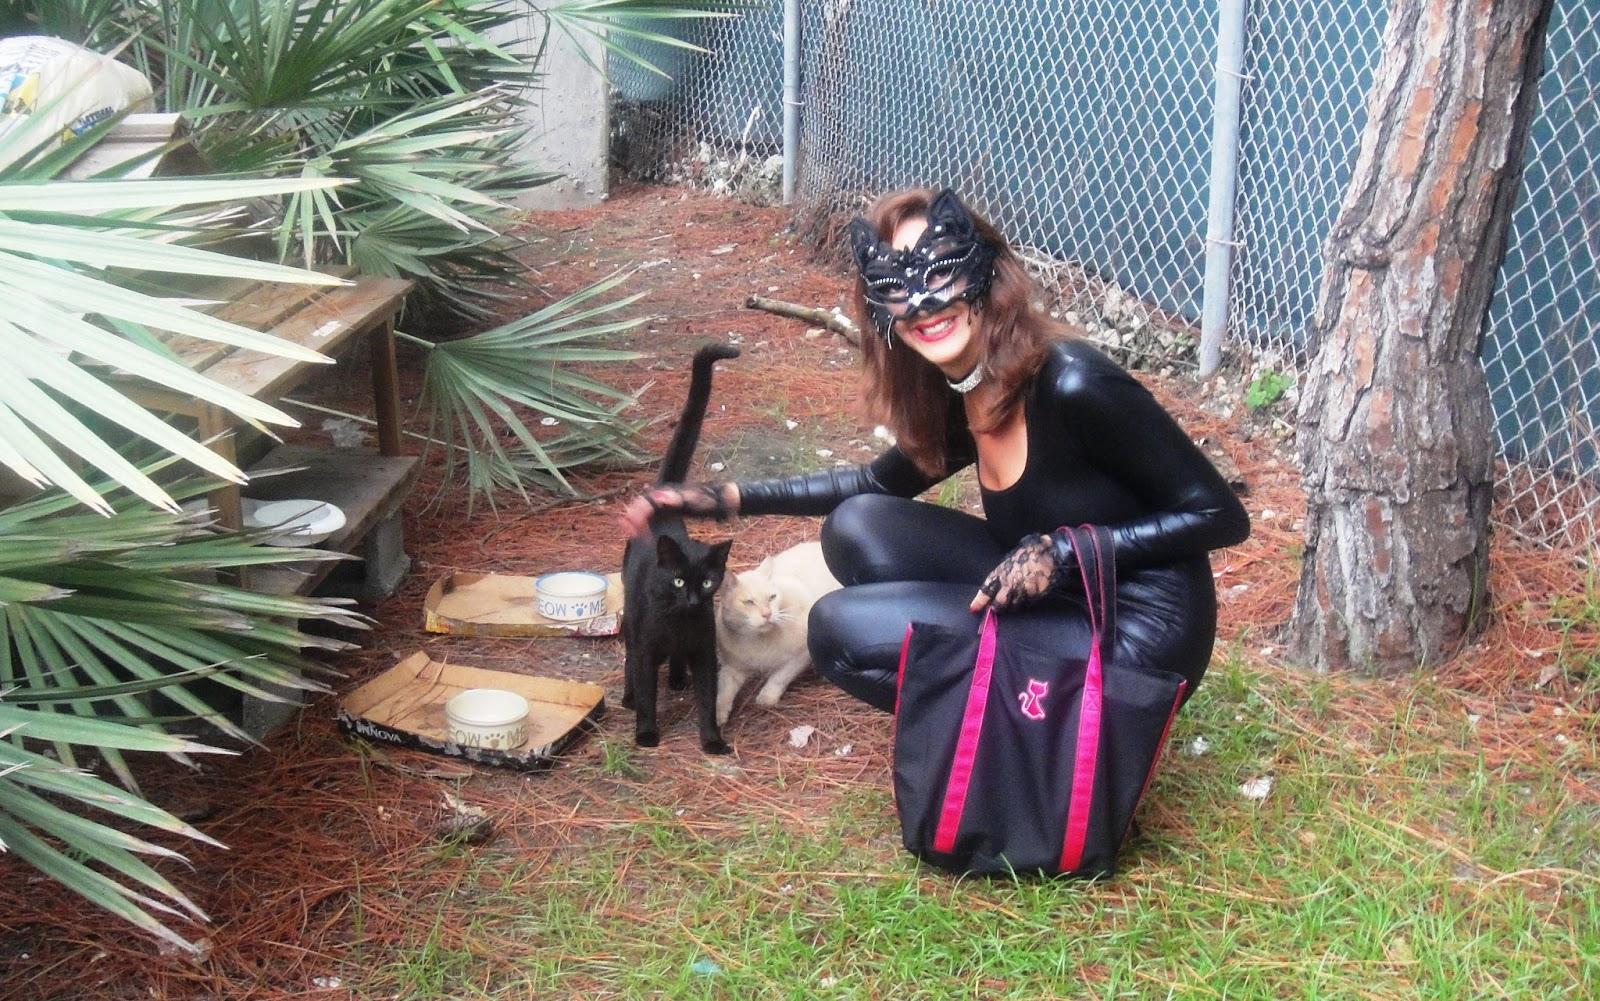 Christine in costume squatting with Leroy, LK-rev